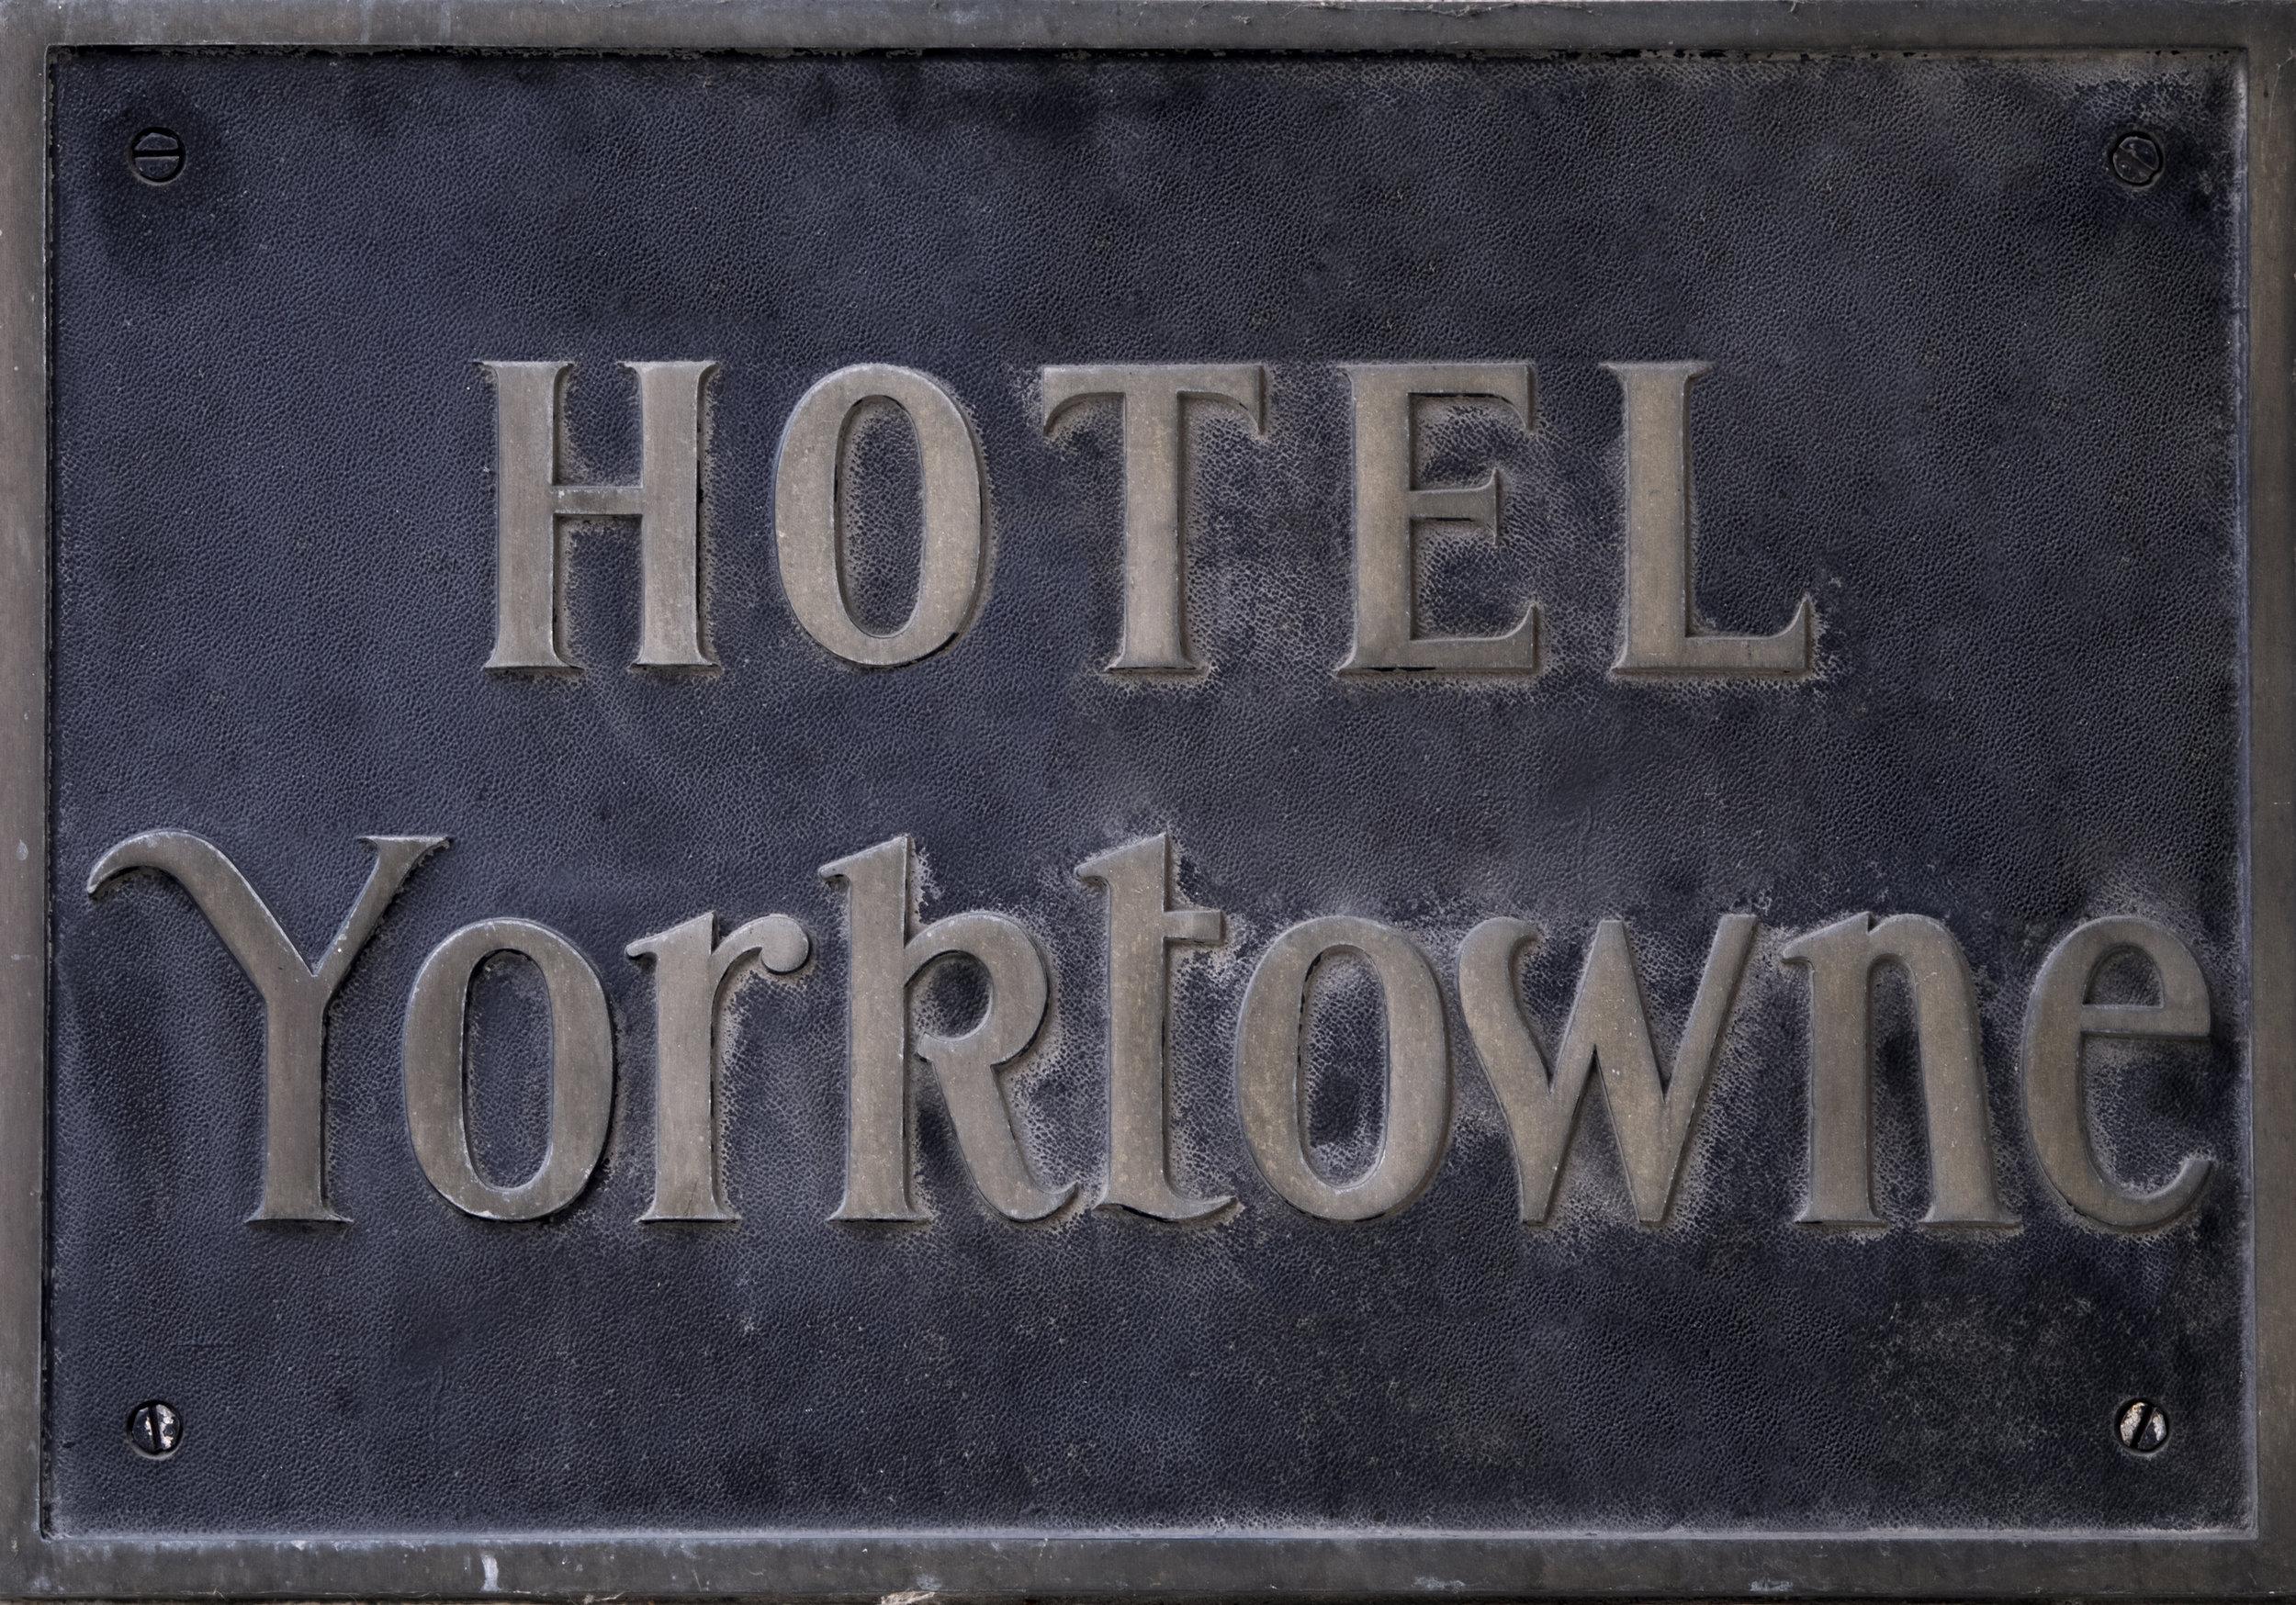 Yorktown Metal Sign.jpg